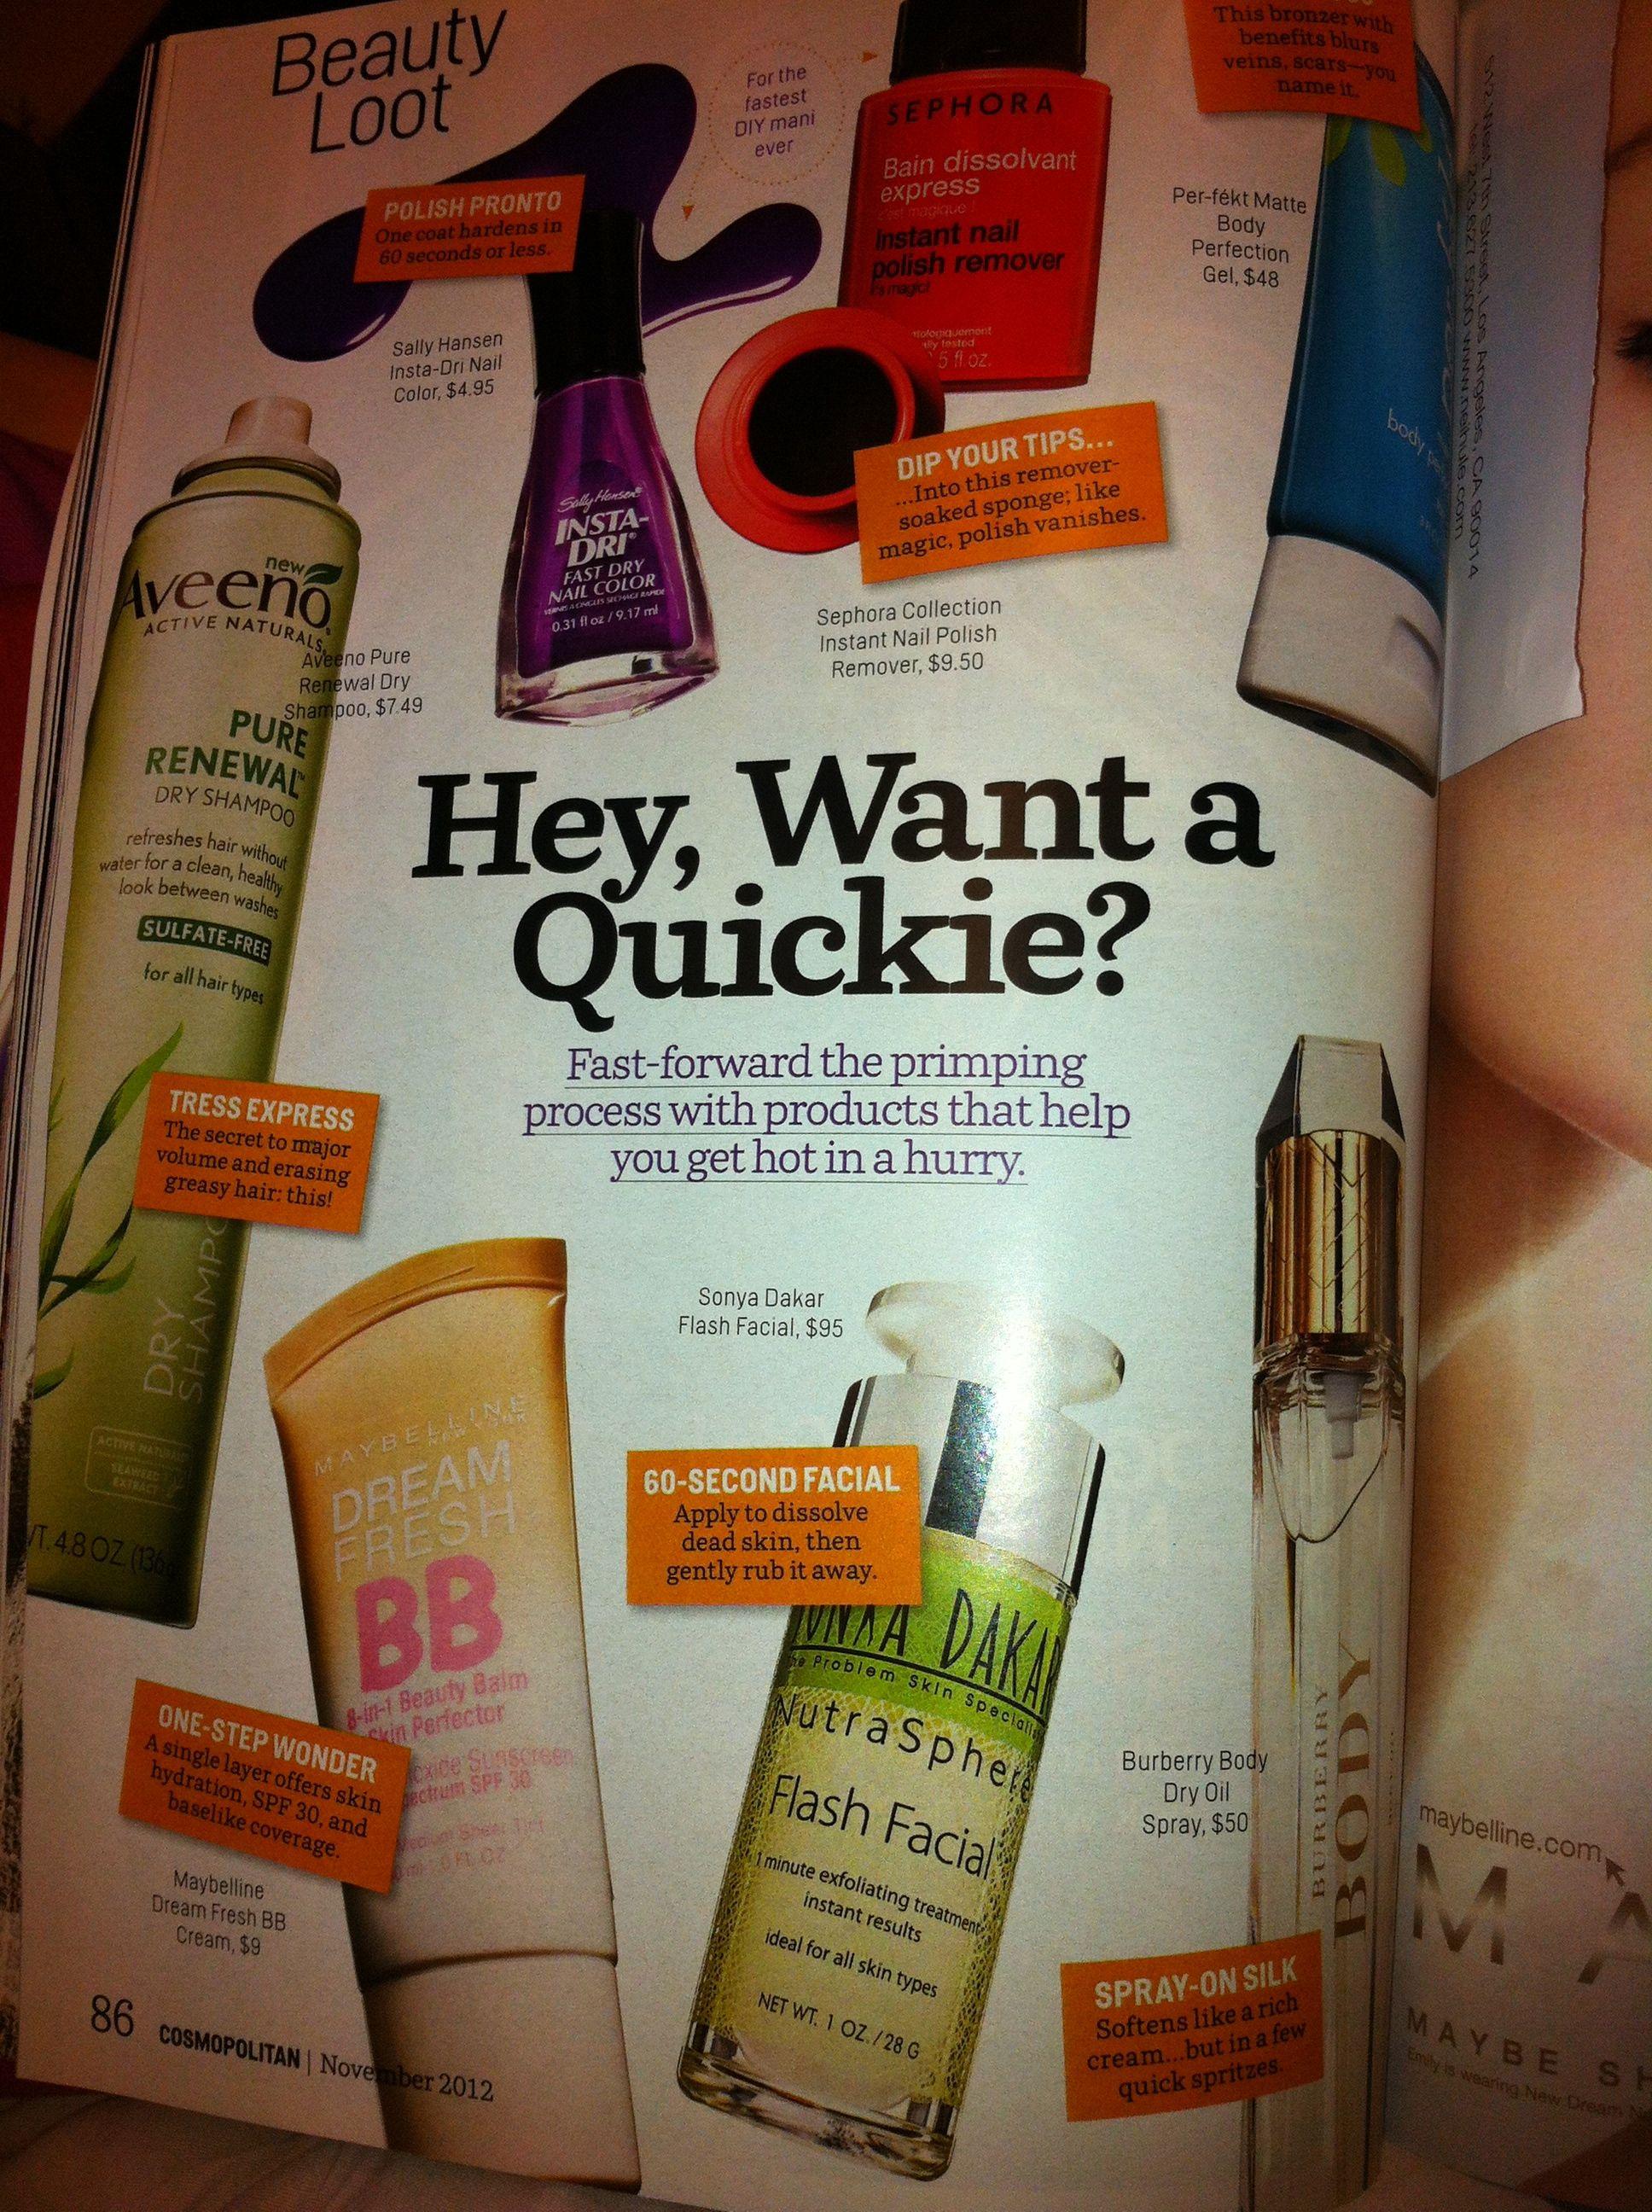 "@Cosmopolitan Magazine 's Beauty Loot""Hey, Want a Quickie?"" @sonyadakar NutraSphere Flash Facial"